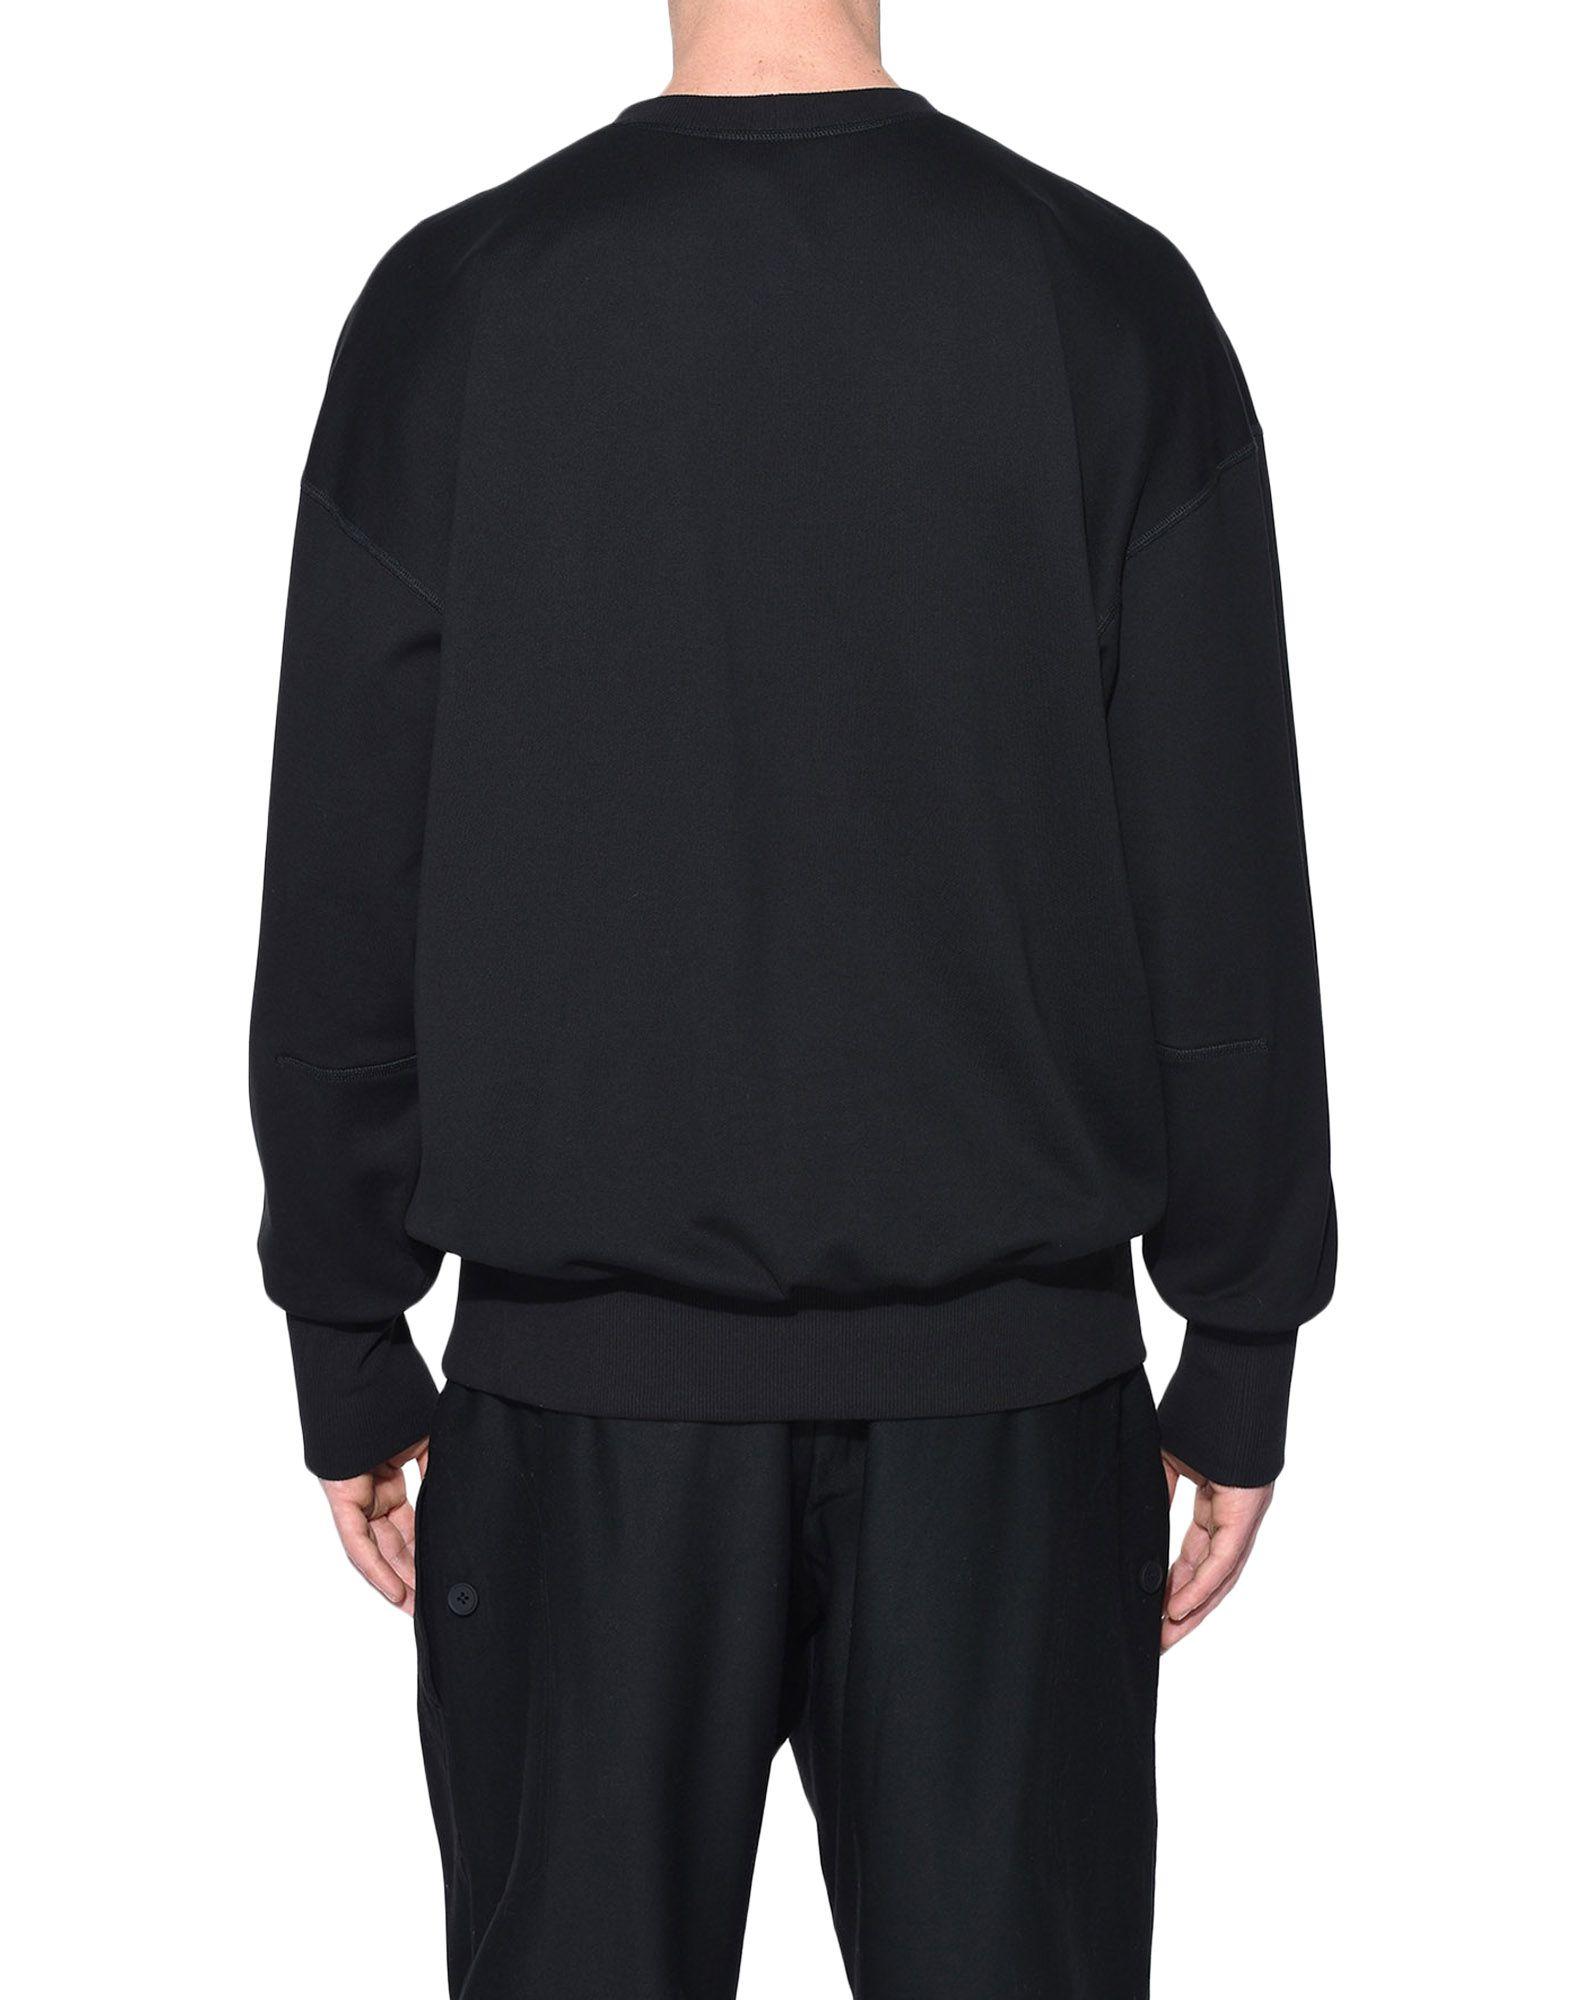 Y-3 Y-3 Sashiko Slogan Sweater Sweatshirt Man d